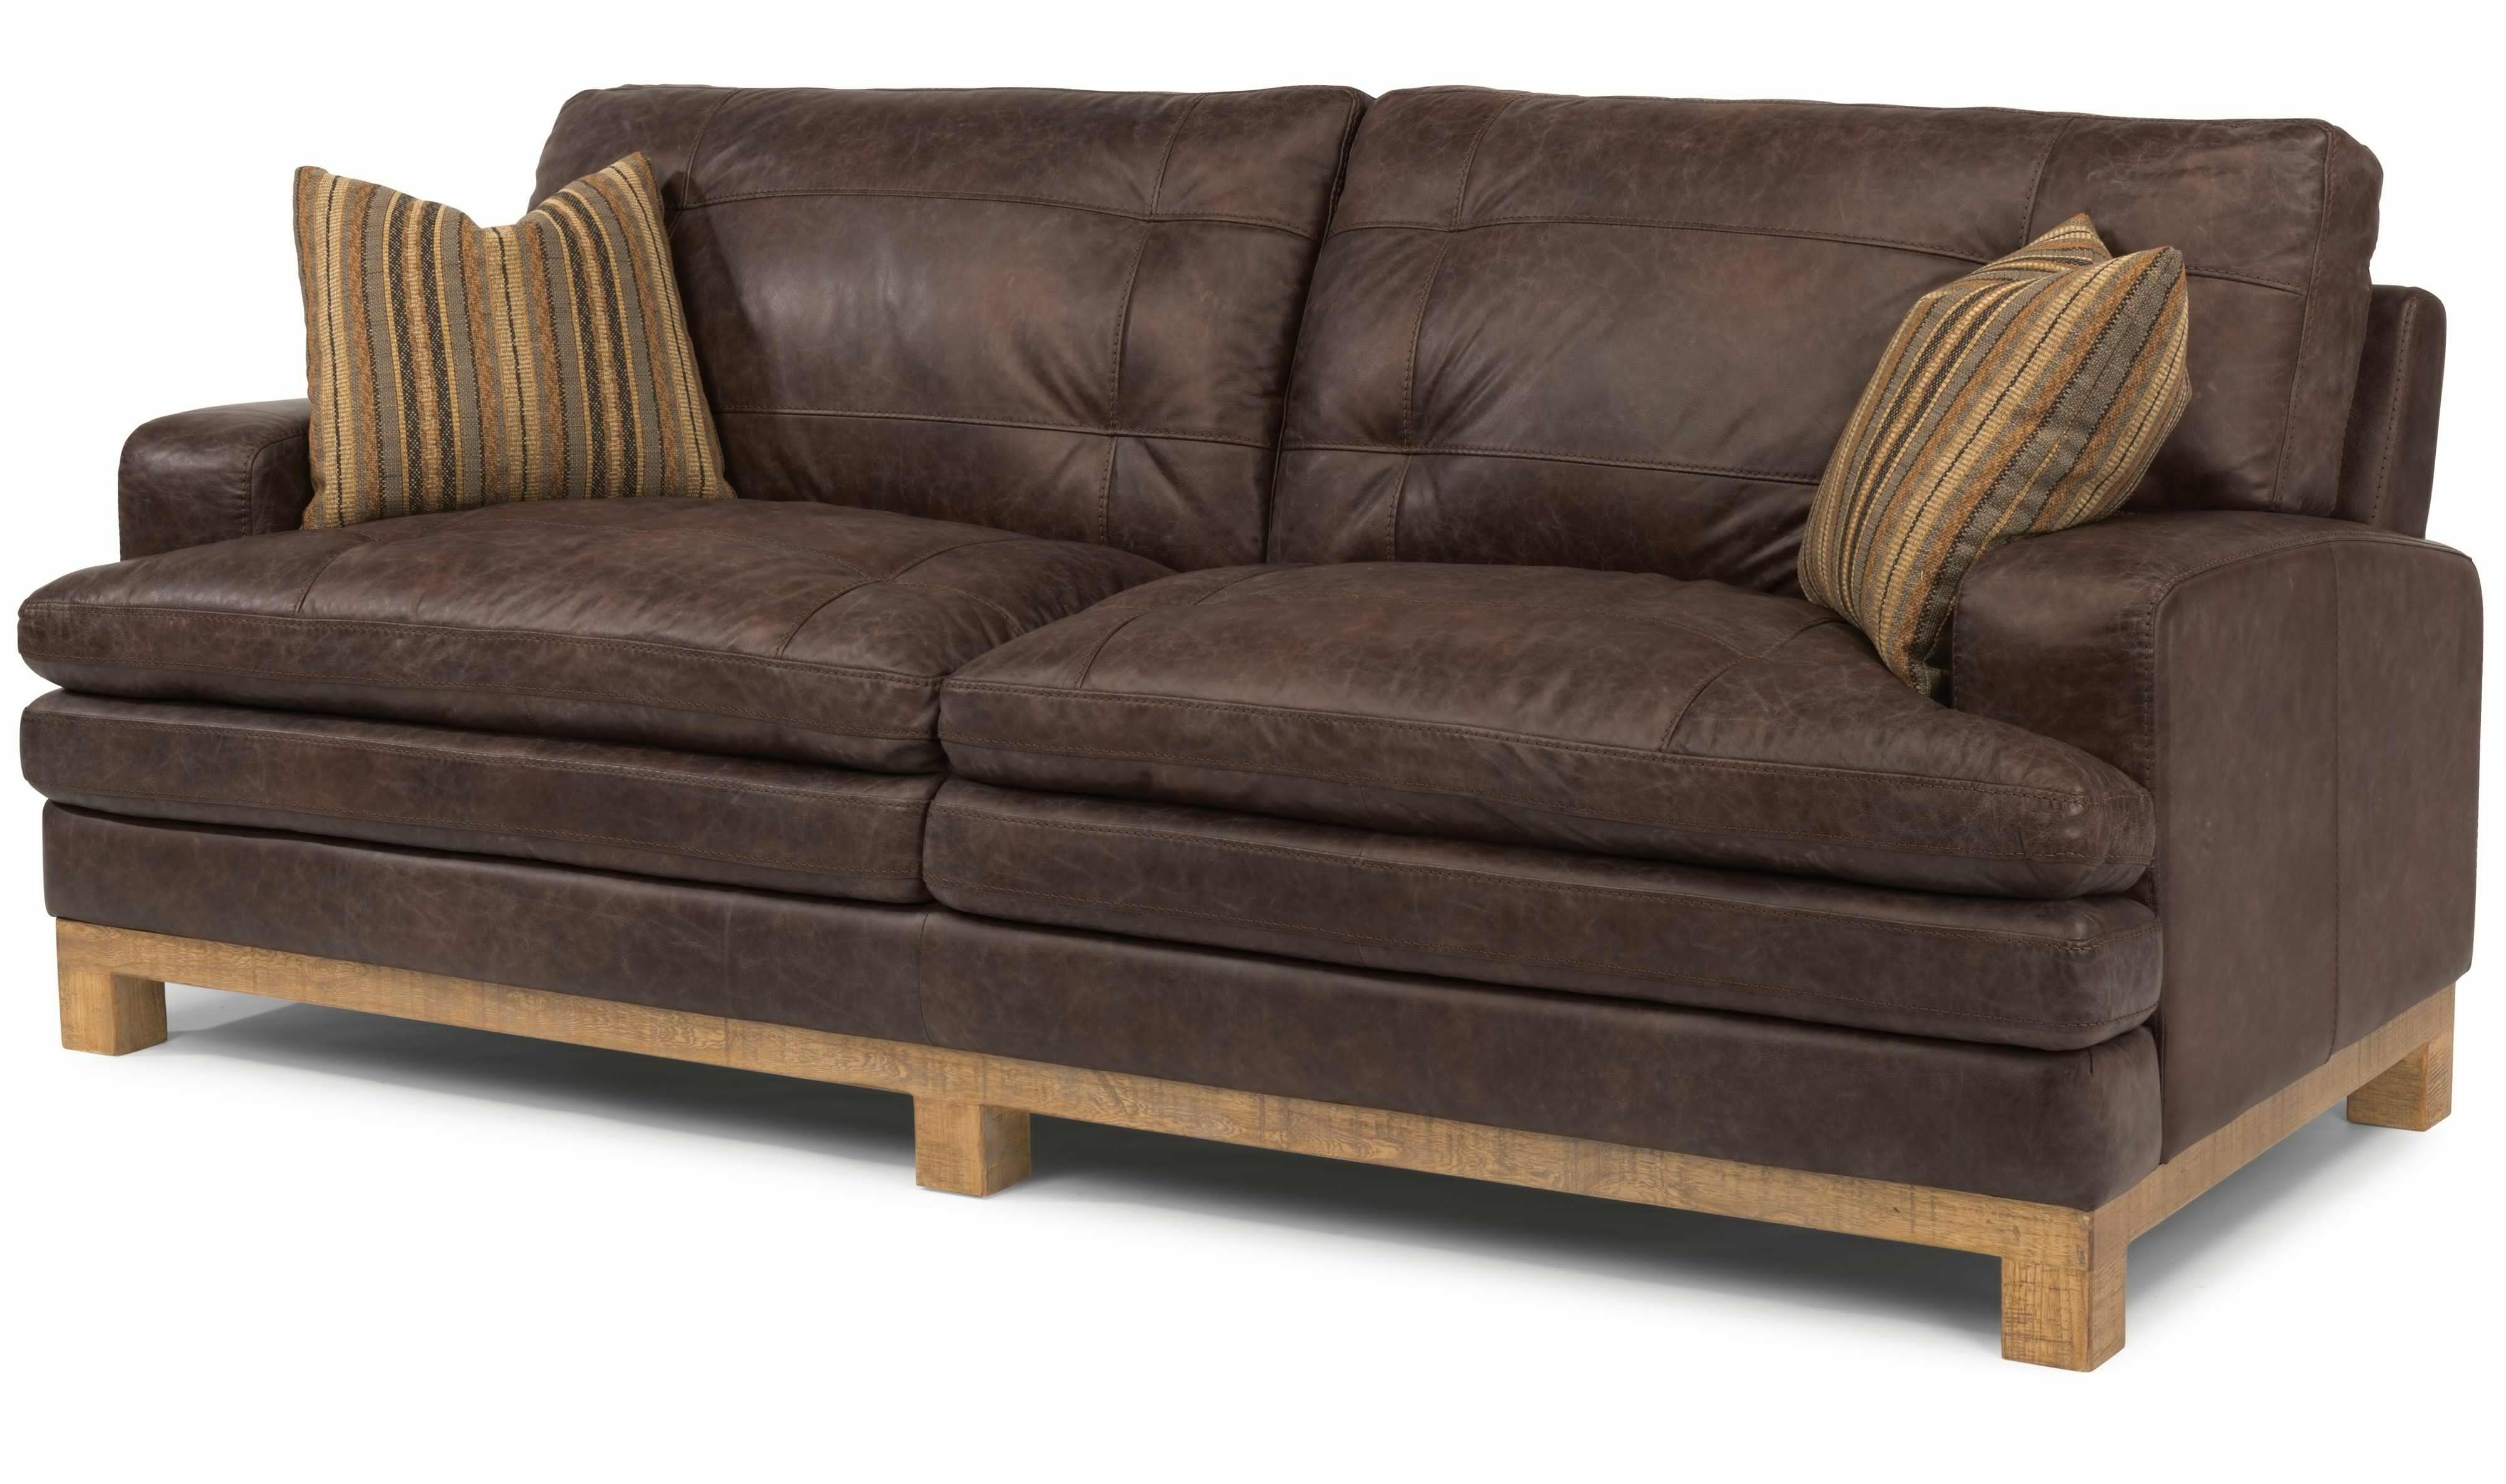 Sectional Sofa Design: Full Grain Leather Sectional Sofa With Current Full Grain Leather Sofas (View 5 of 20)